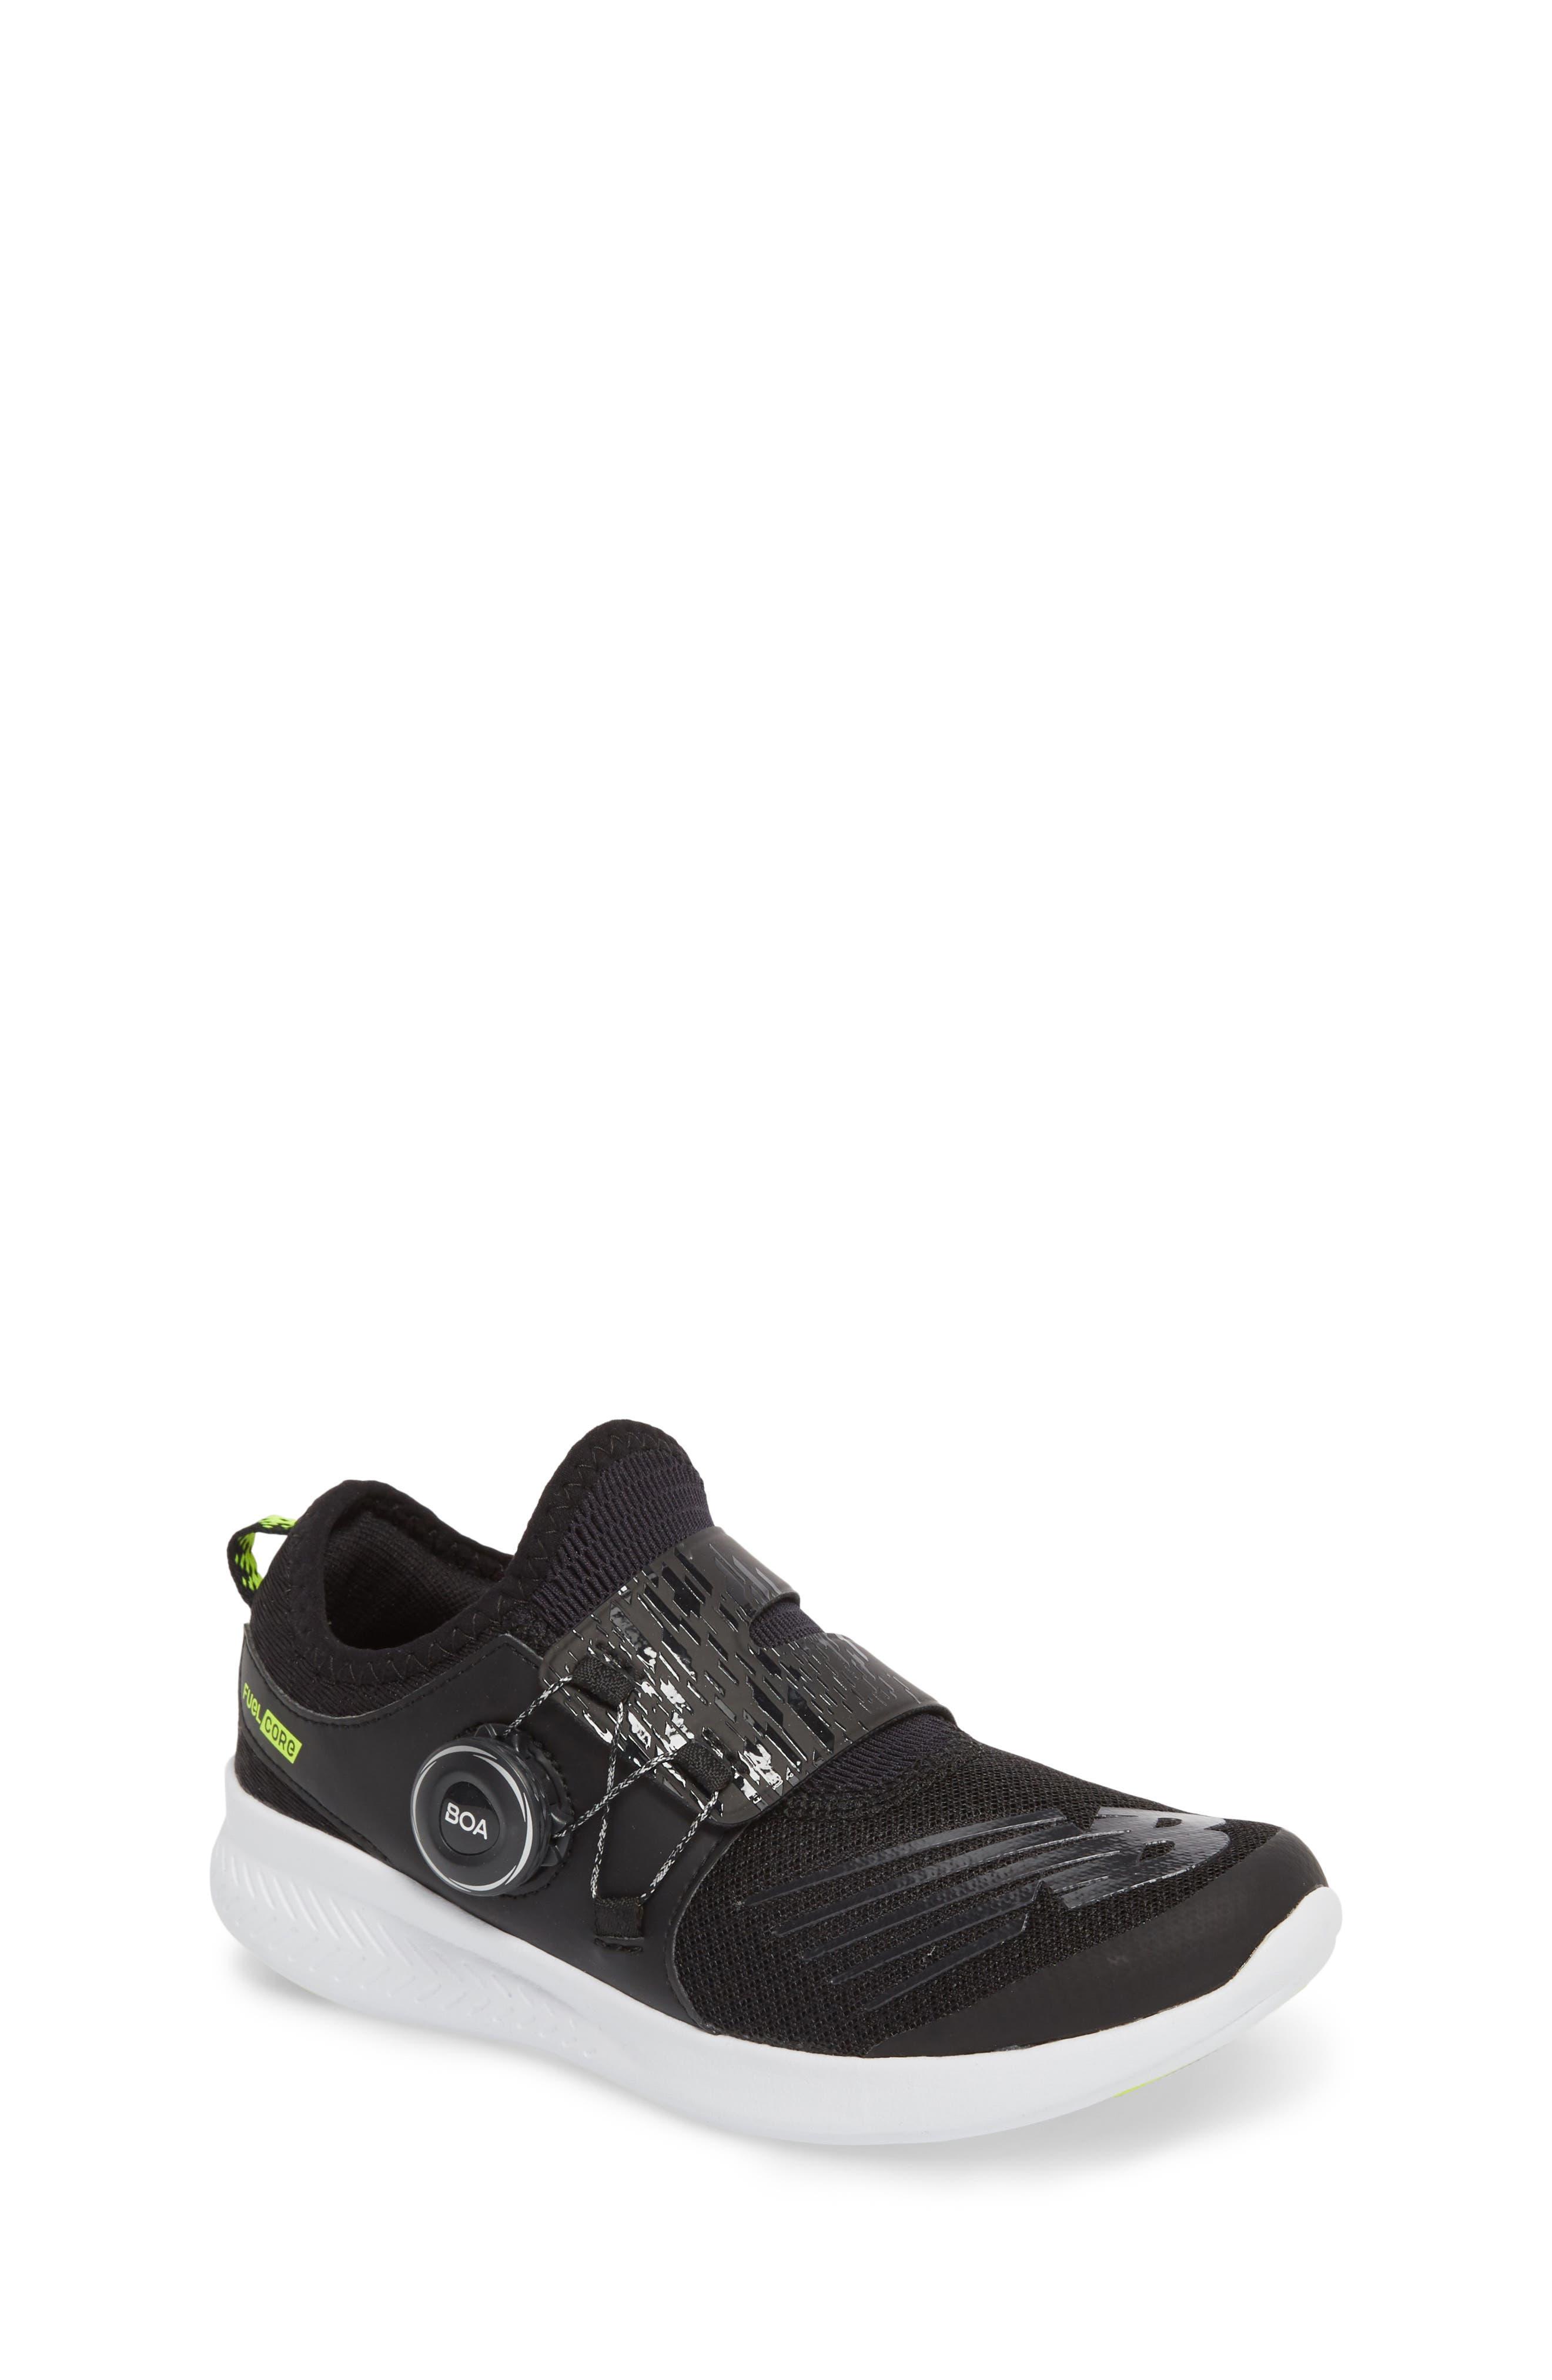 BKO Running Shoe,                         Main,                         color, Black/ Hi Lite